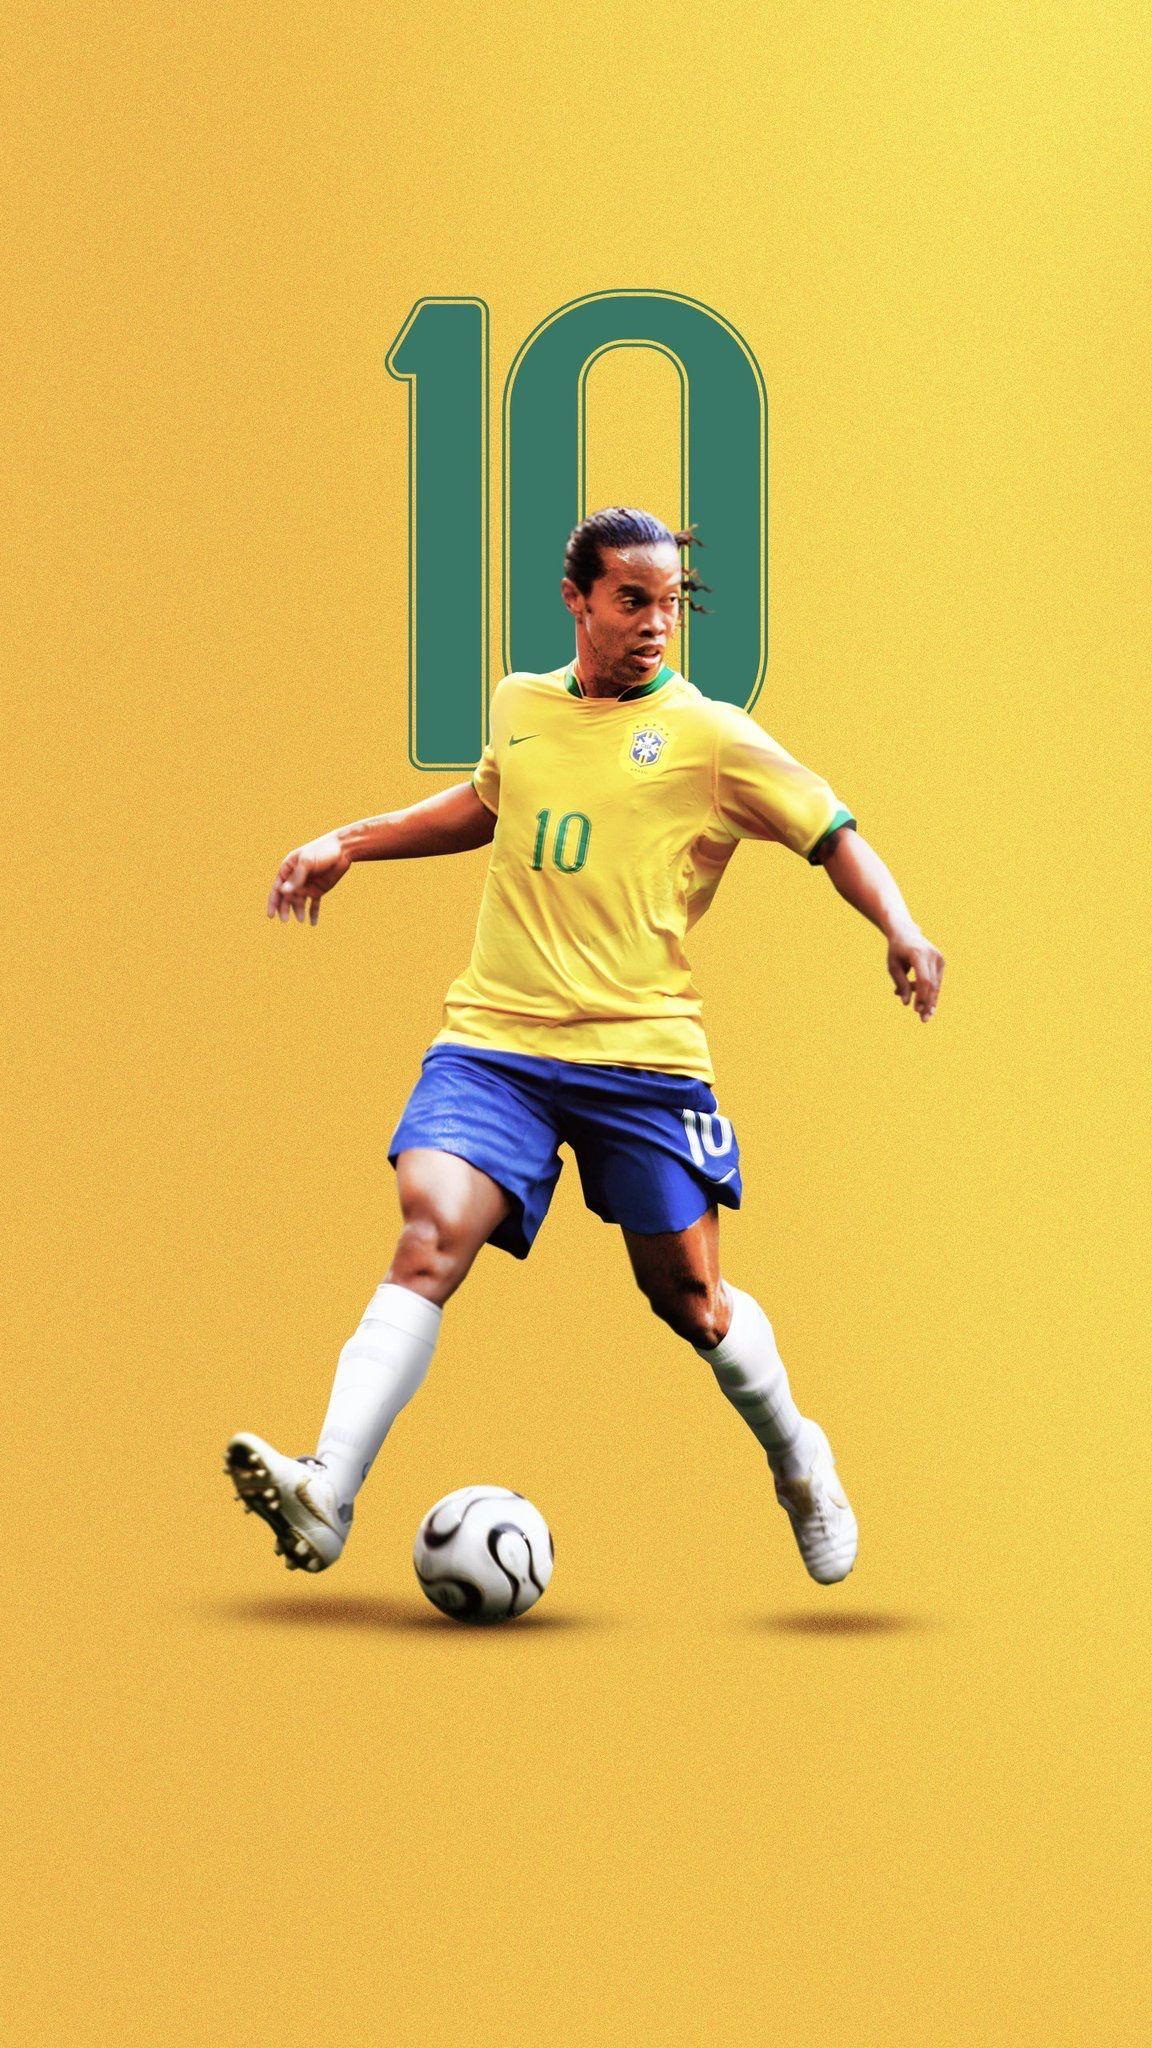 Pin De Cesilia Mariana En R10 En 2020 Gifs De Futbol Leyendas De Futbol Futbol Wallpapers